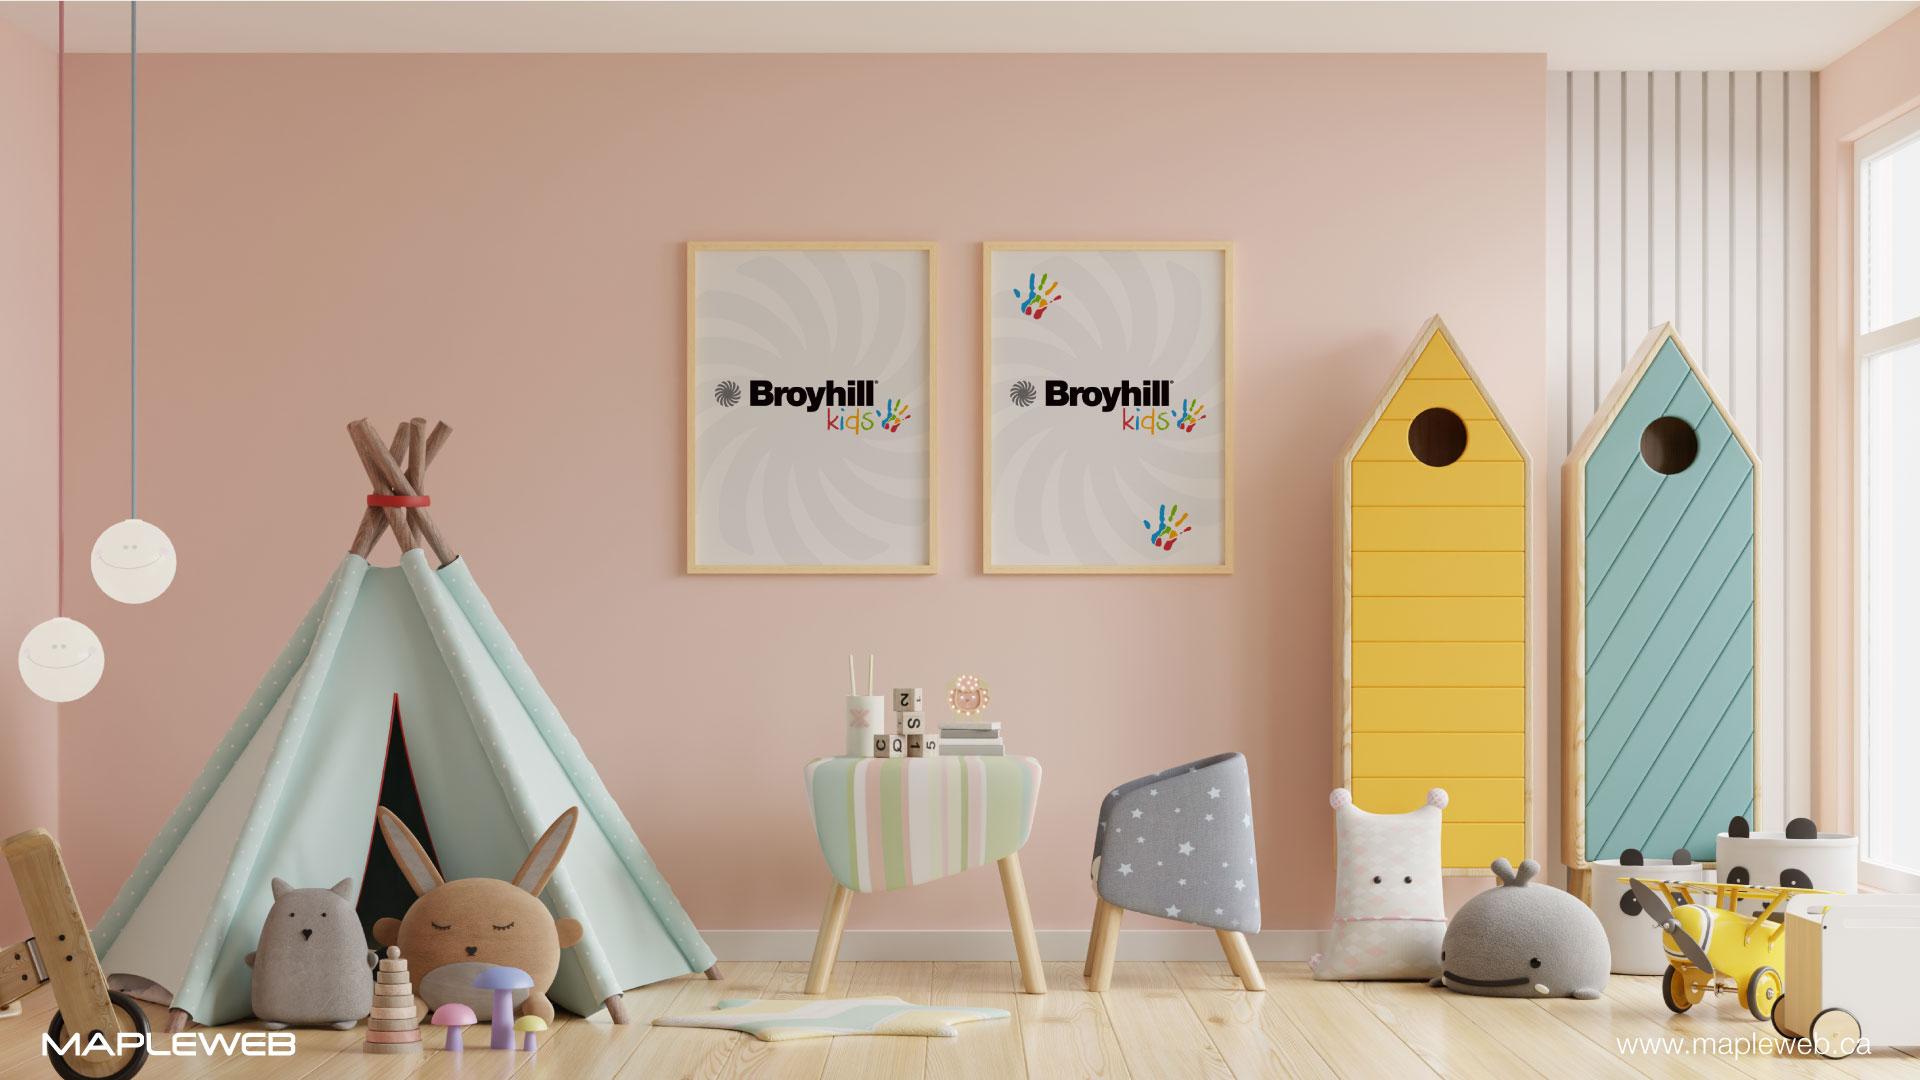 broyhill-kids-brand-logo-design-by-mapleweb-vancouver-canada-kids-room-mock